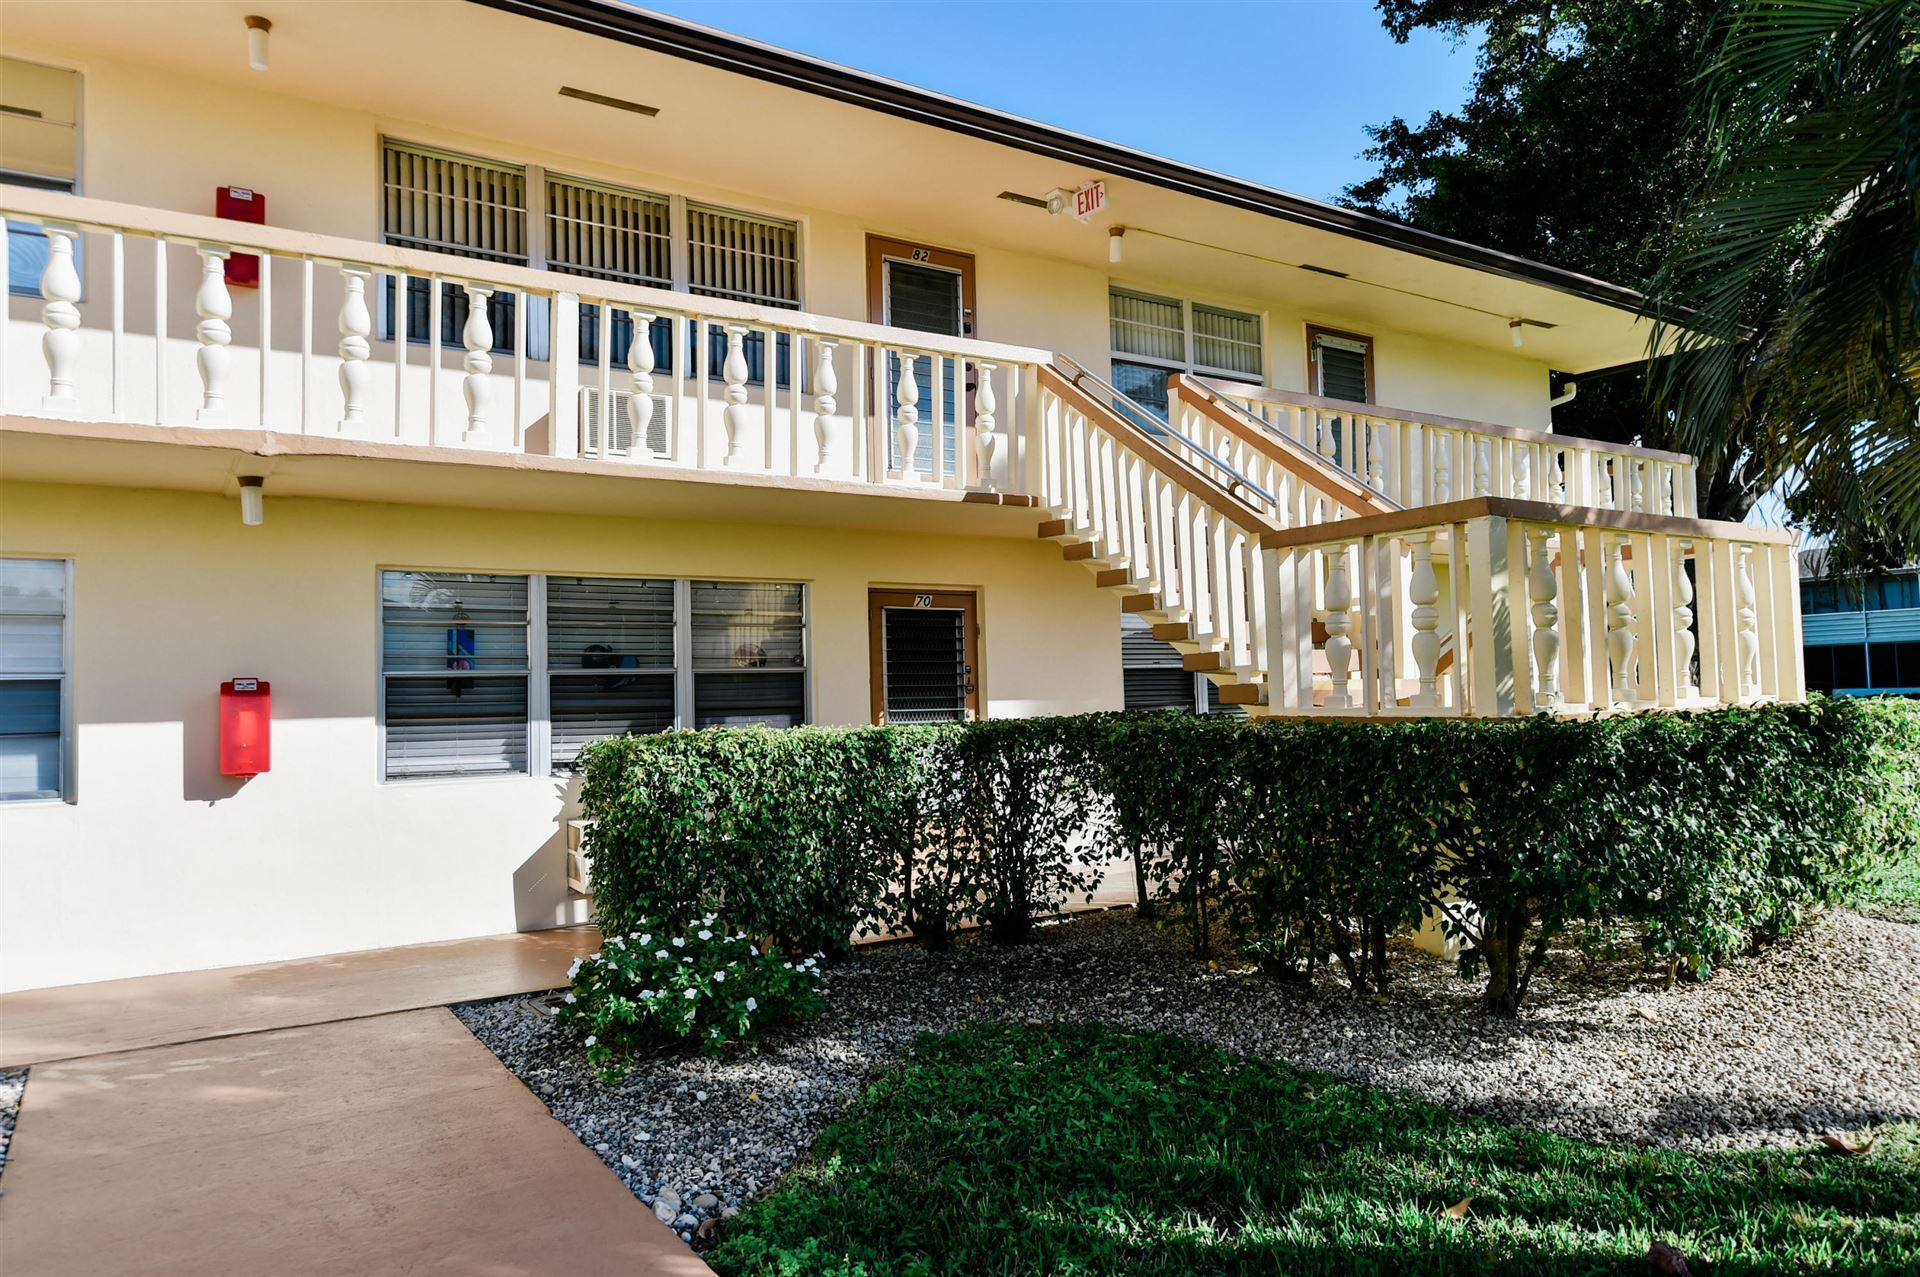 70 Dorchester #D, West Palm Beach, FL 33417 - MLS#: RX-10690954